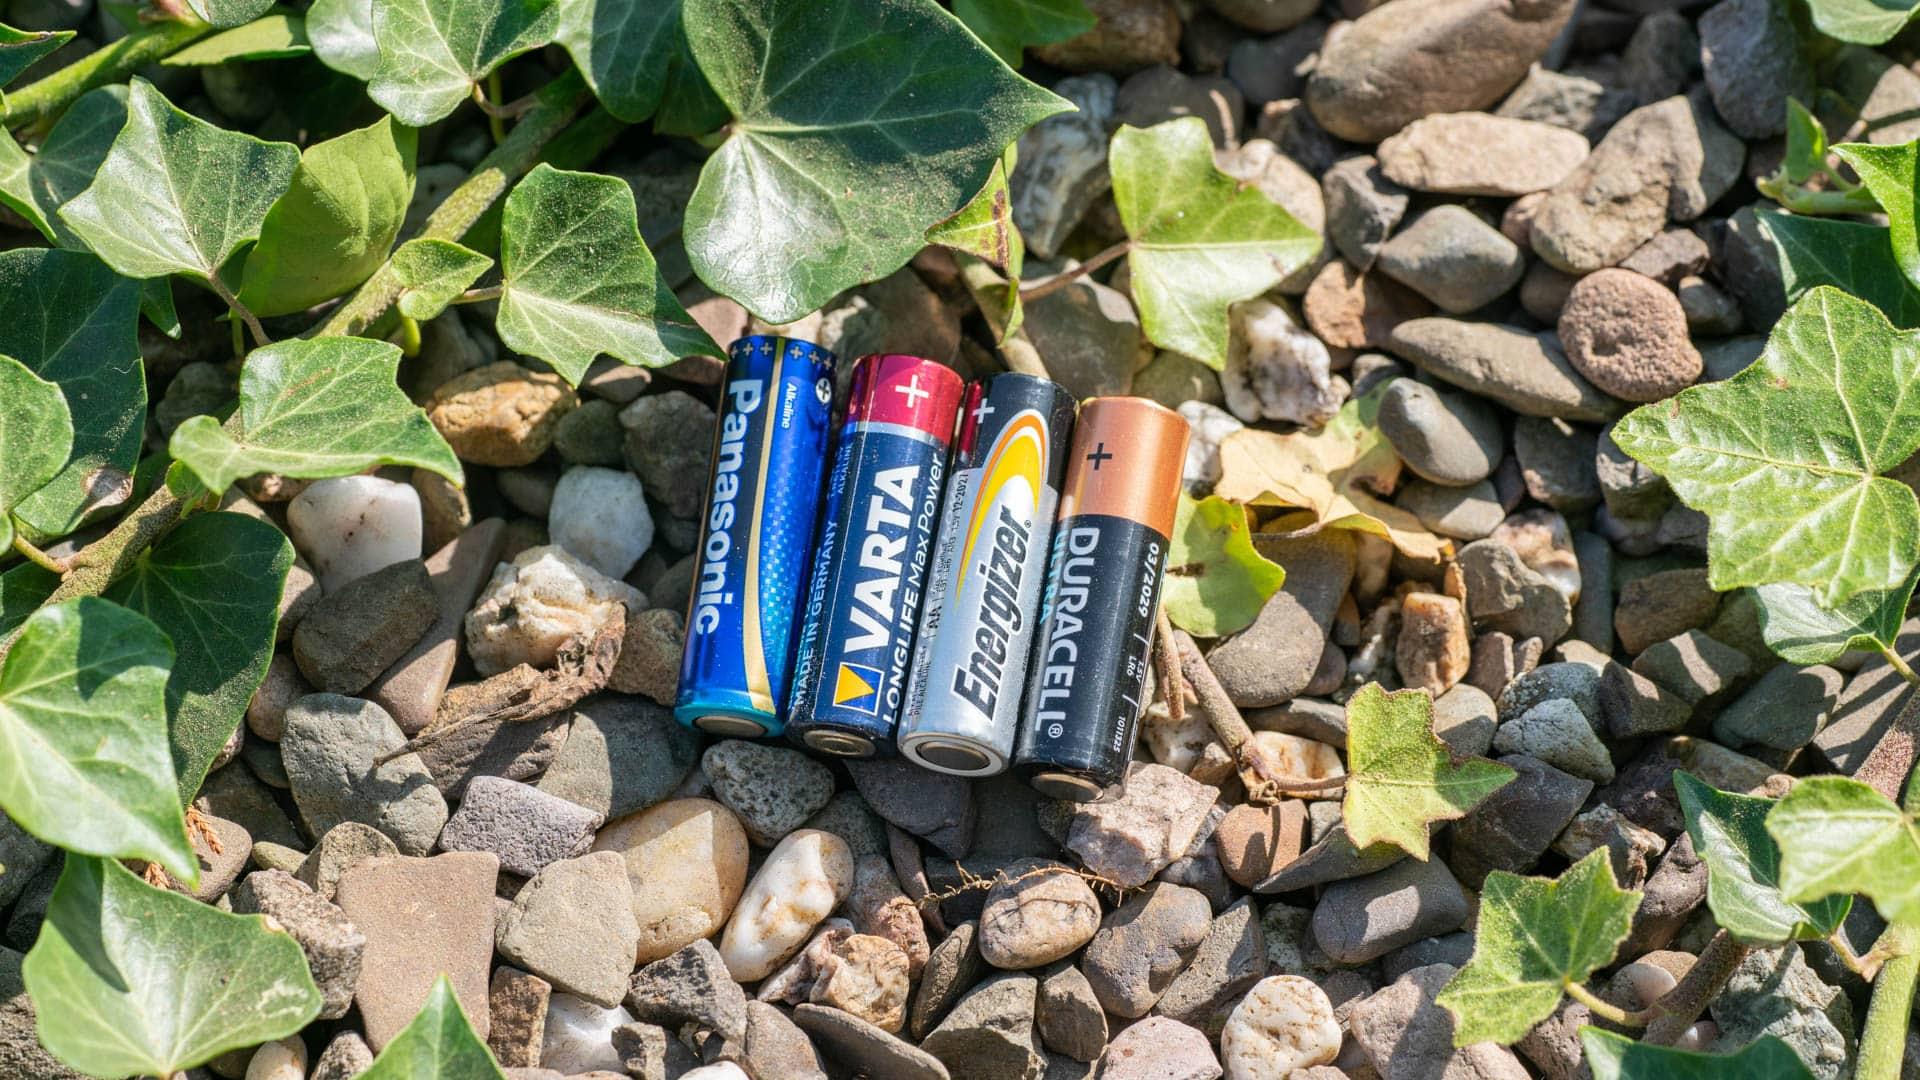 Welche sind die besten High End Batterien? Duracell vs. Panasonic vs. Energizer vs. VARTA